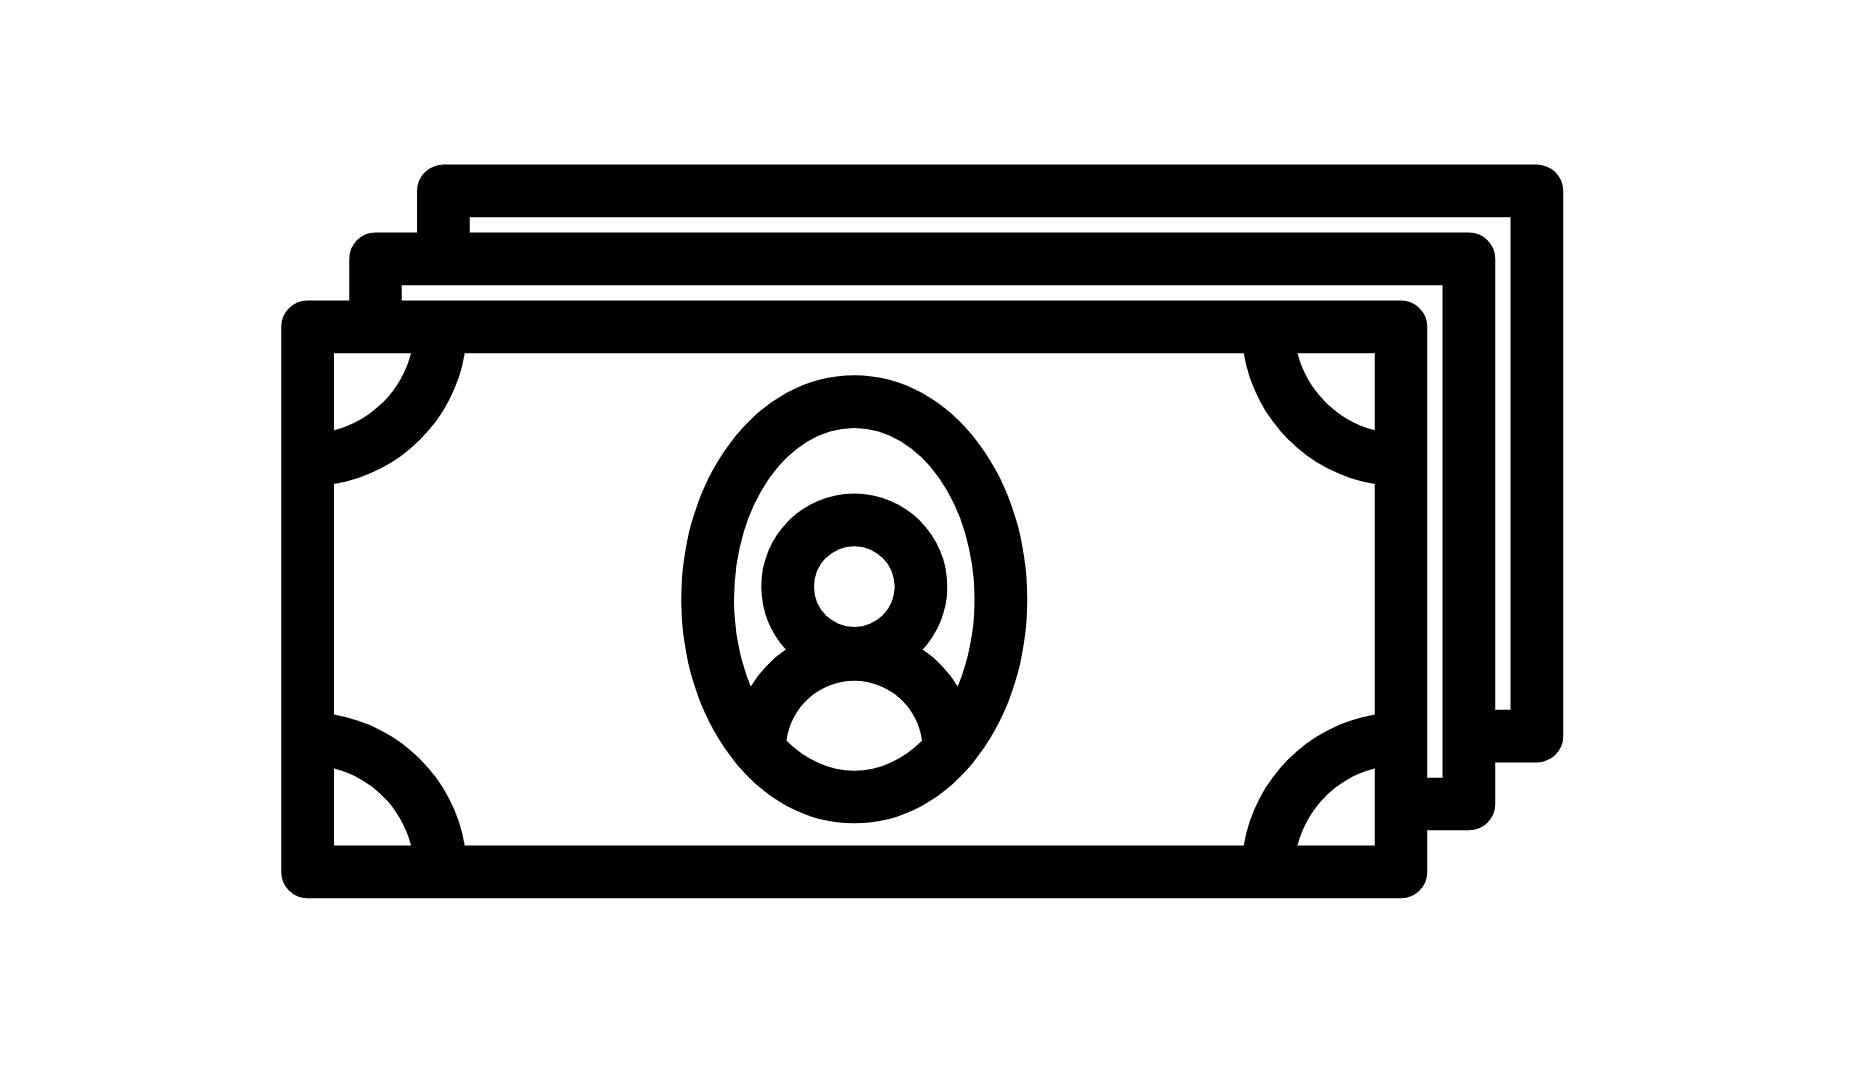 PCH.com Casting for Cash Giveaway